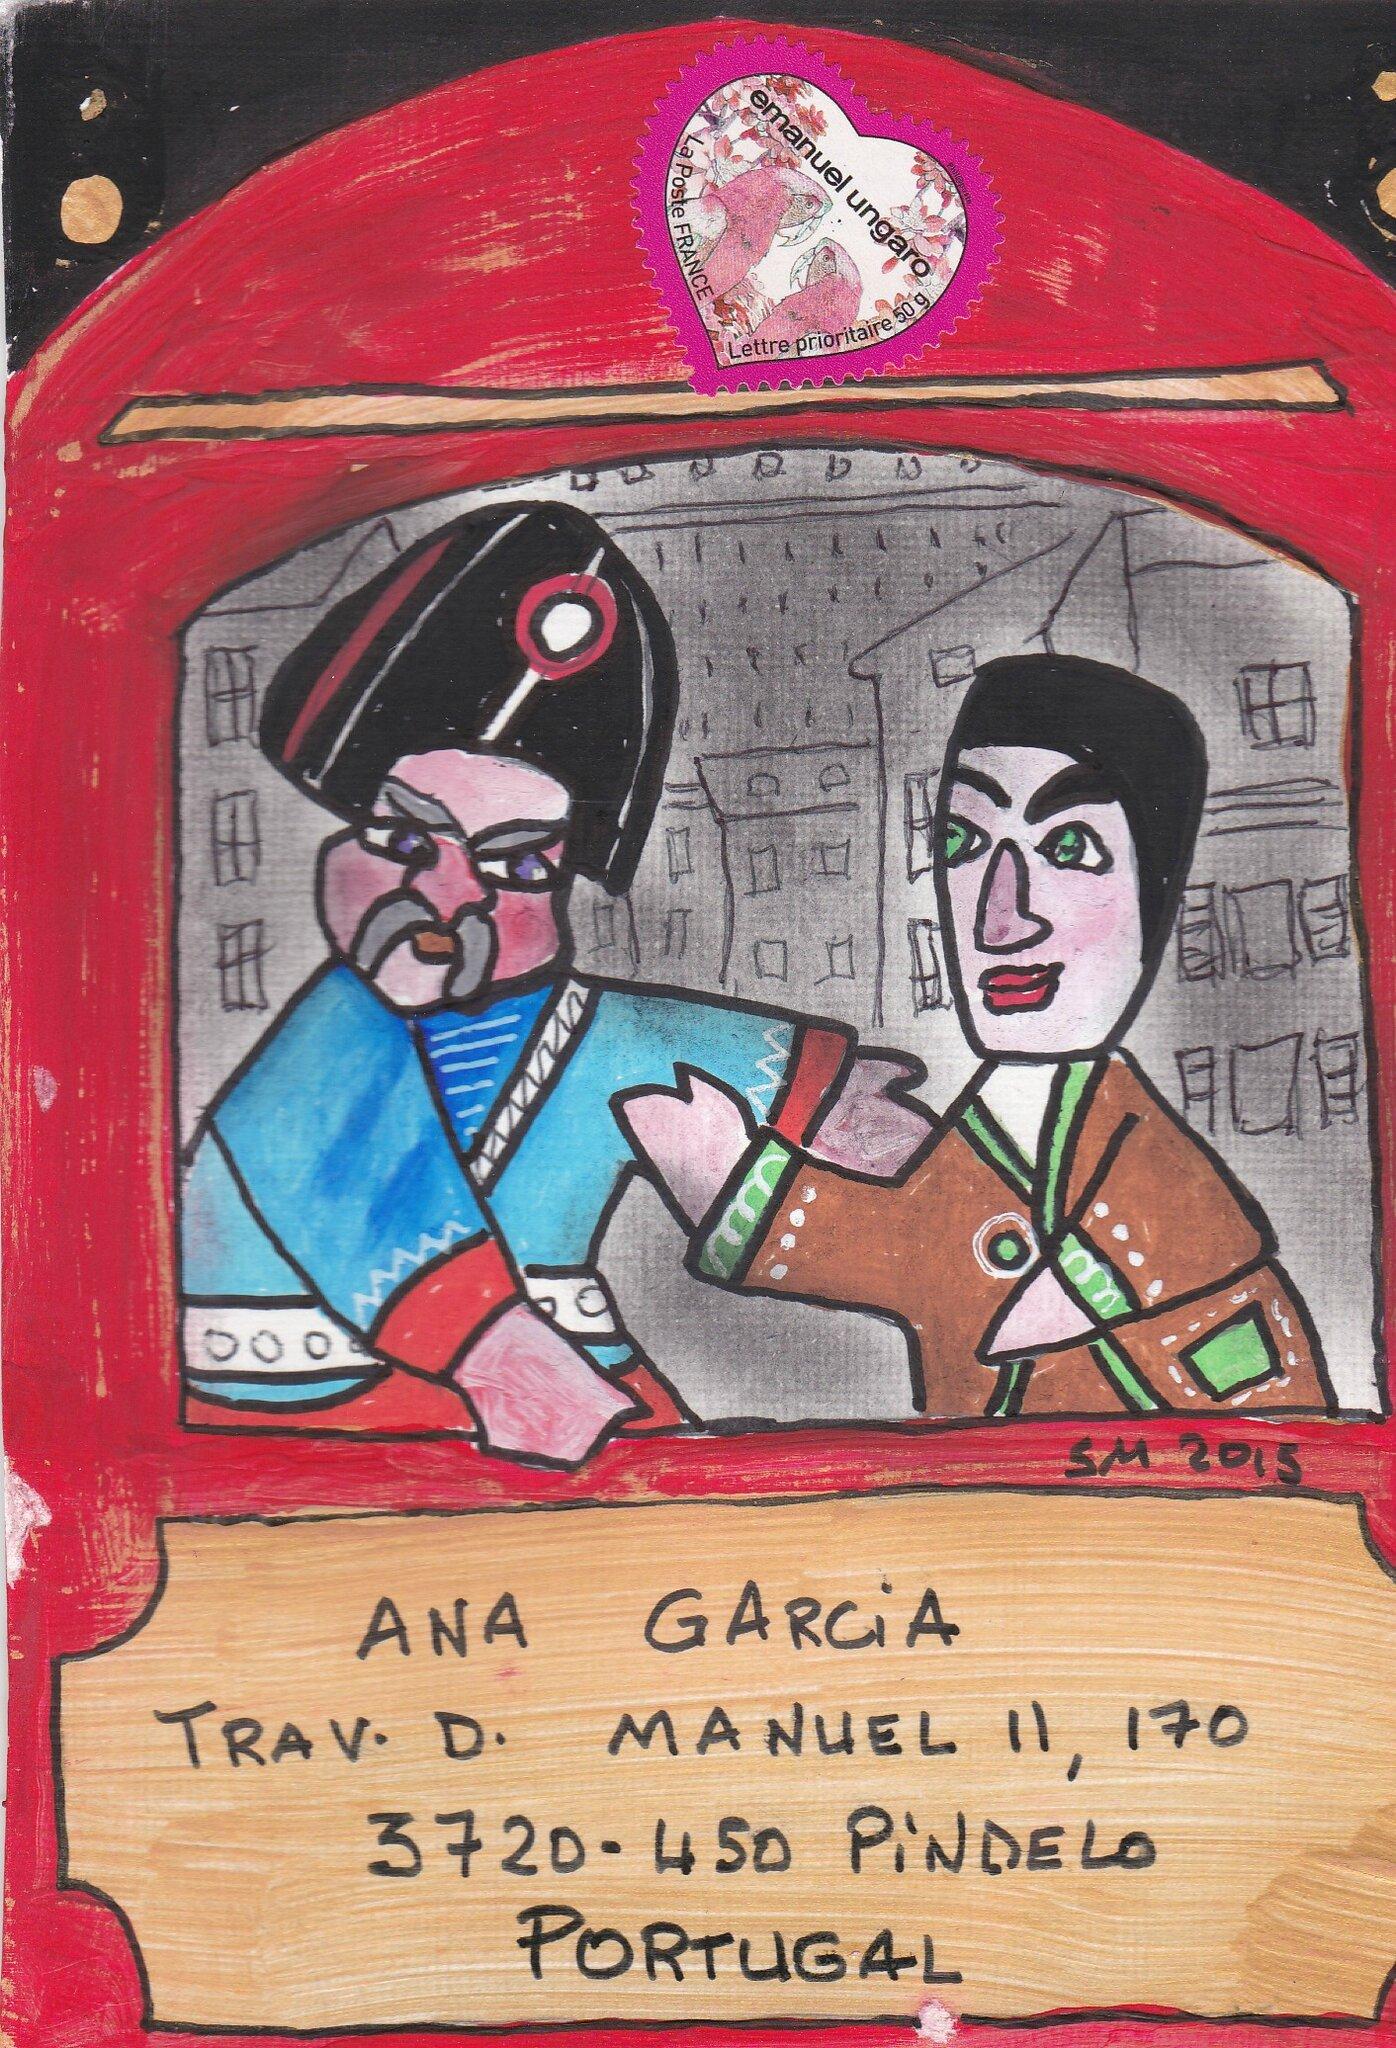 Ana Garcia - Portugal